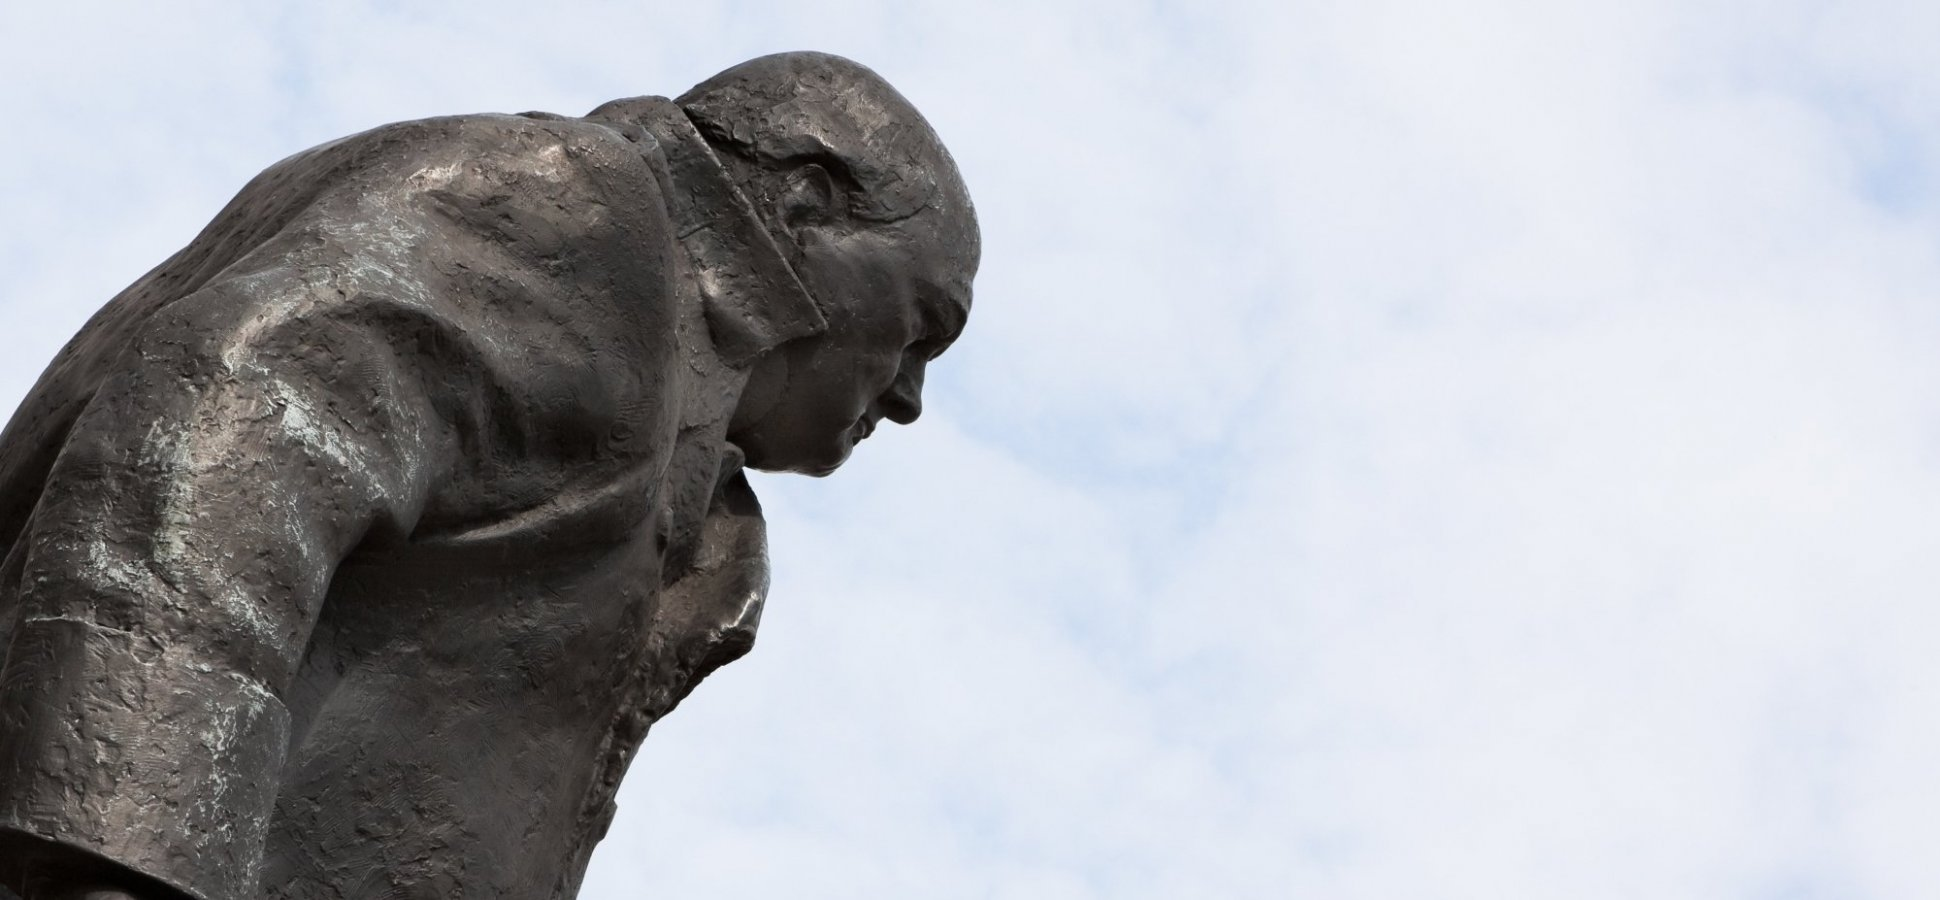 To Master Public Speaking, Listen to Winston Churchill